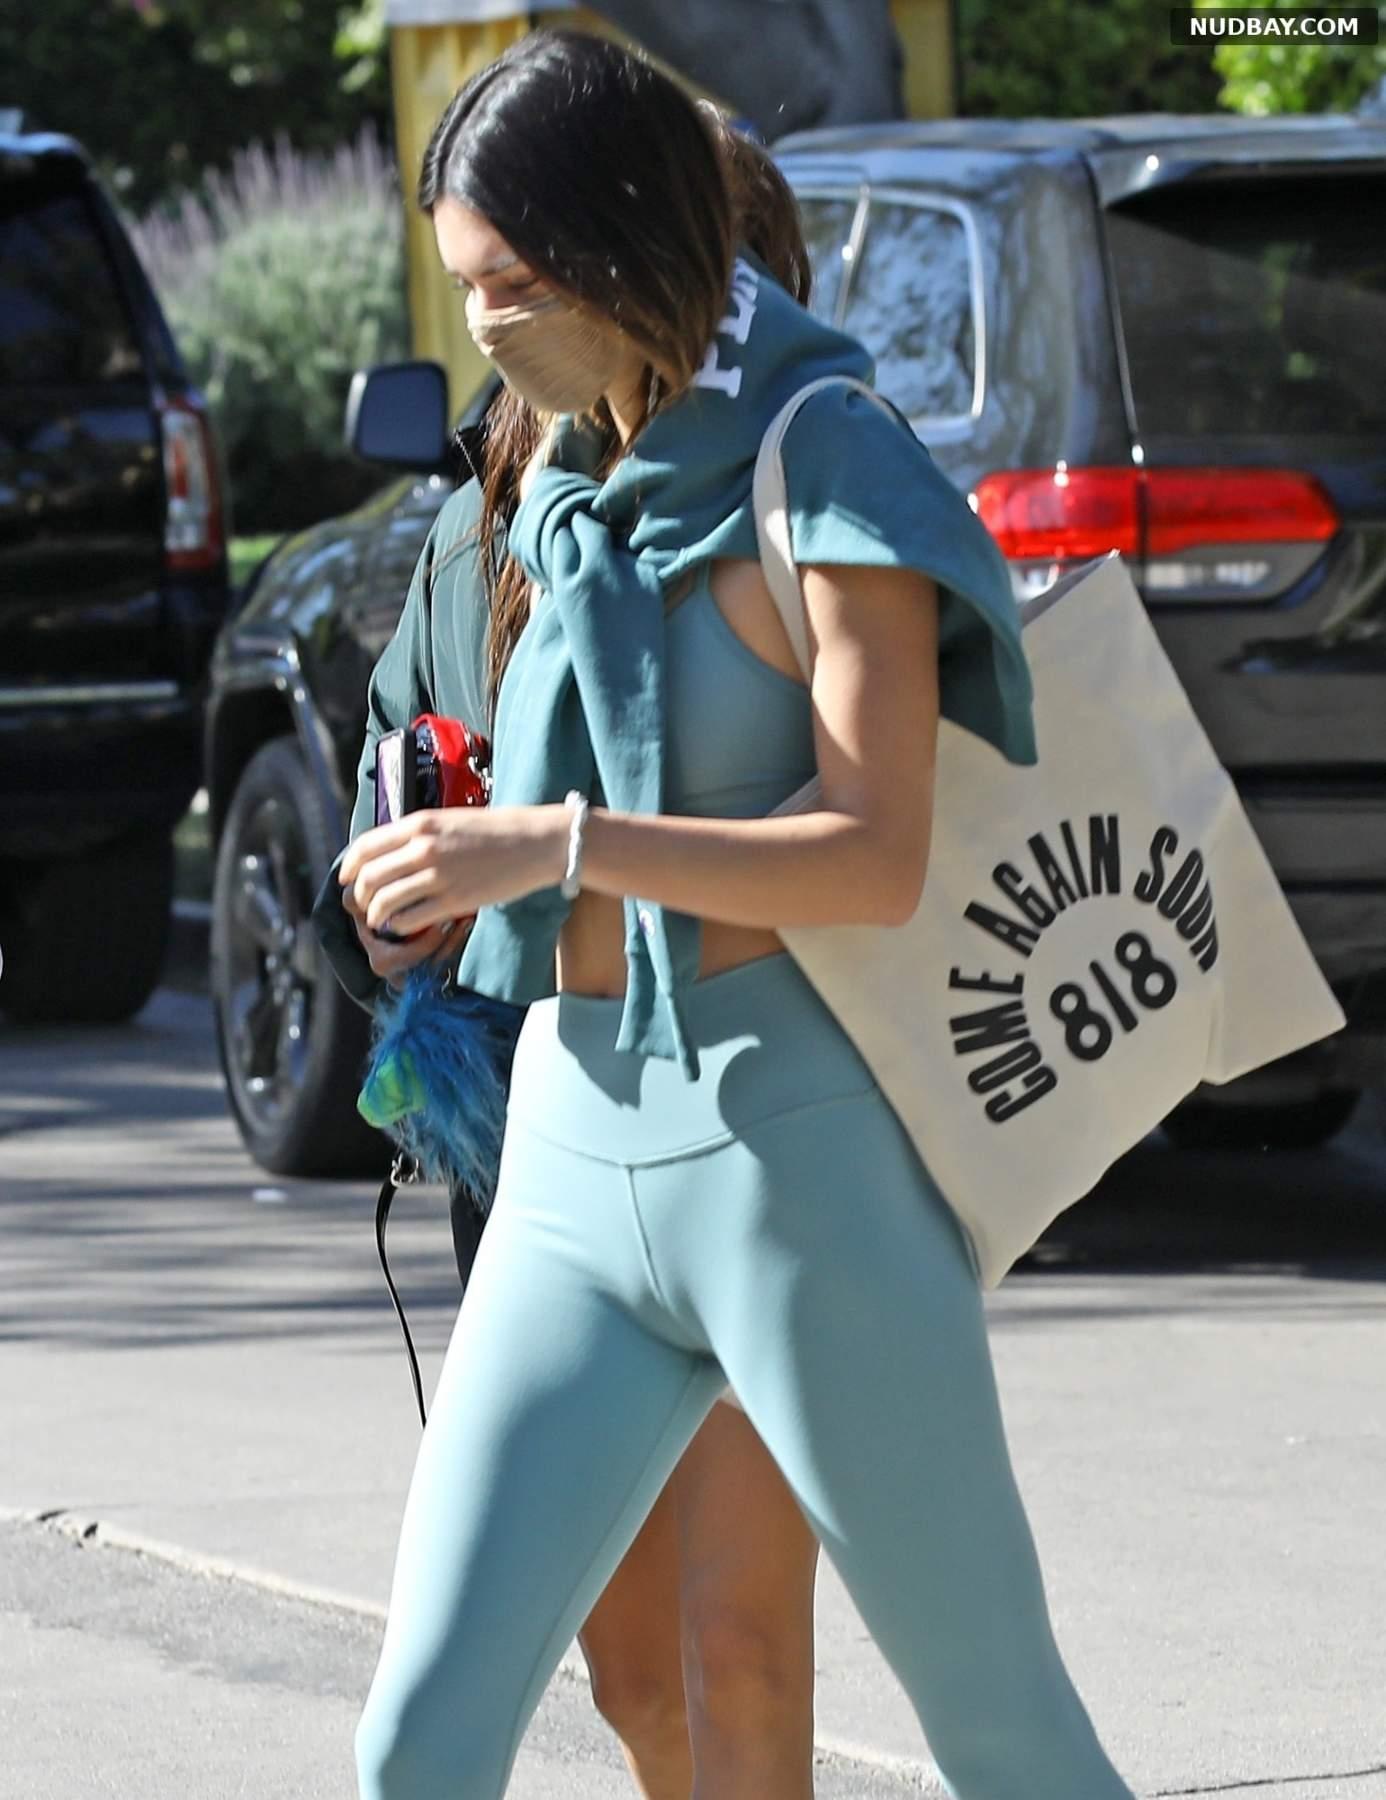 Mila Kunis Cameltoe